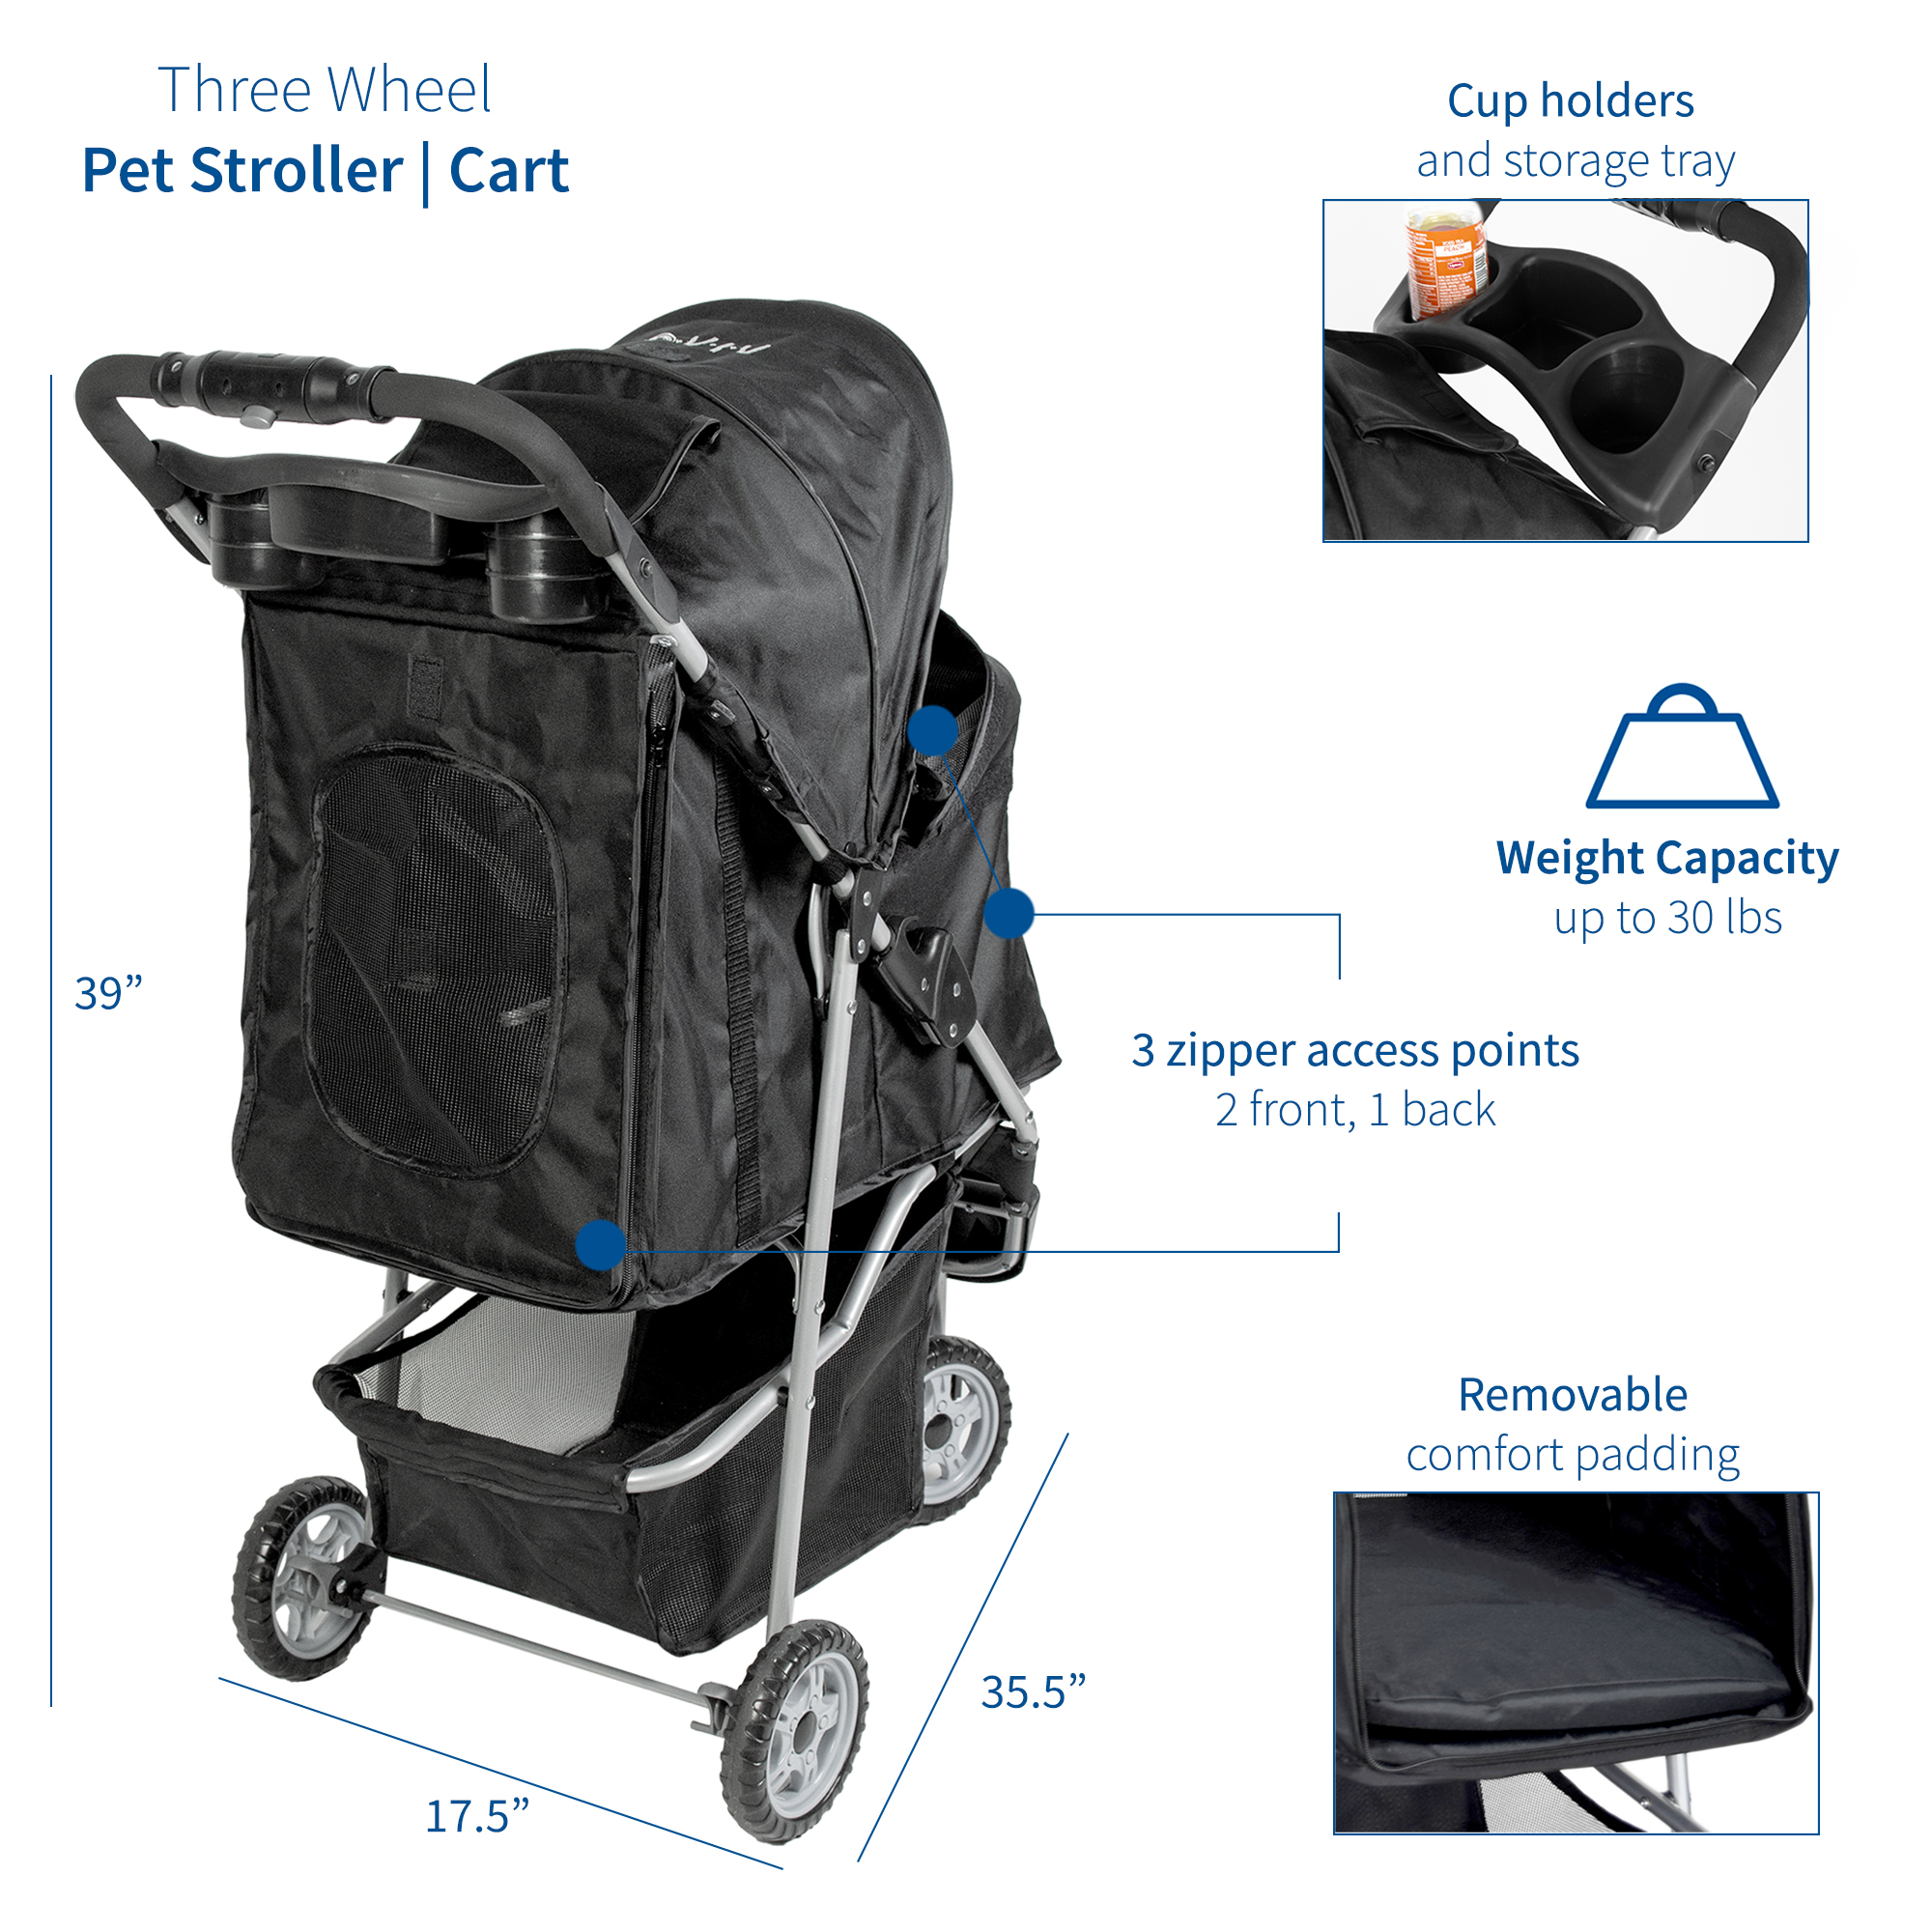 thumbnail 4 - VIVO Three Wheel Pet Stroller / Cat & Dog Foldable Carrier Strolling Cart